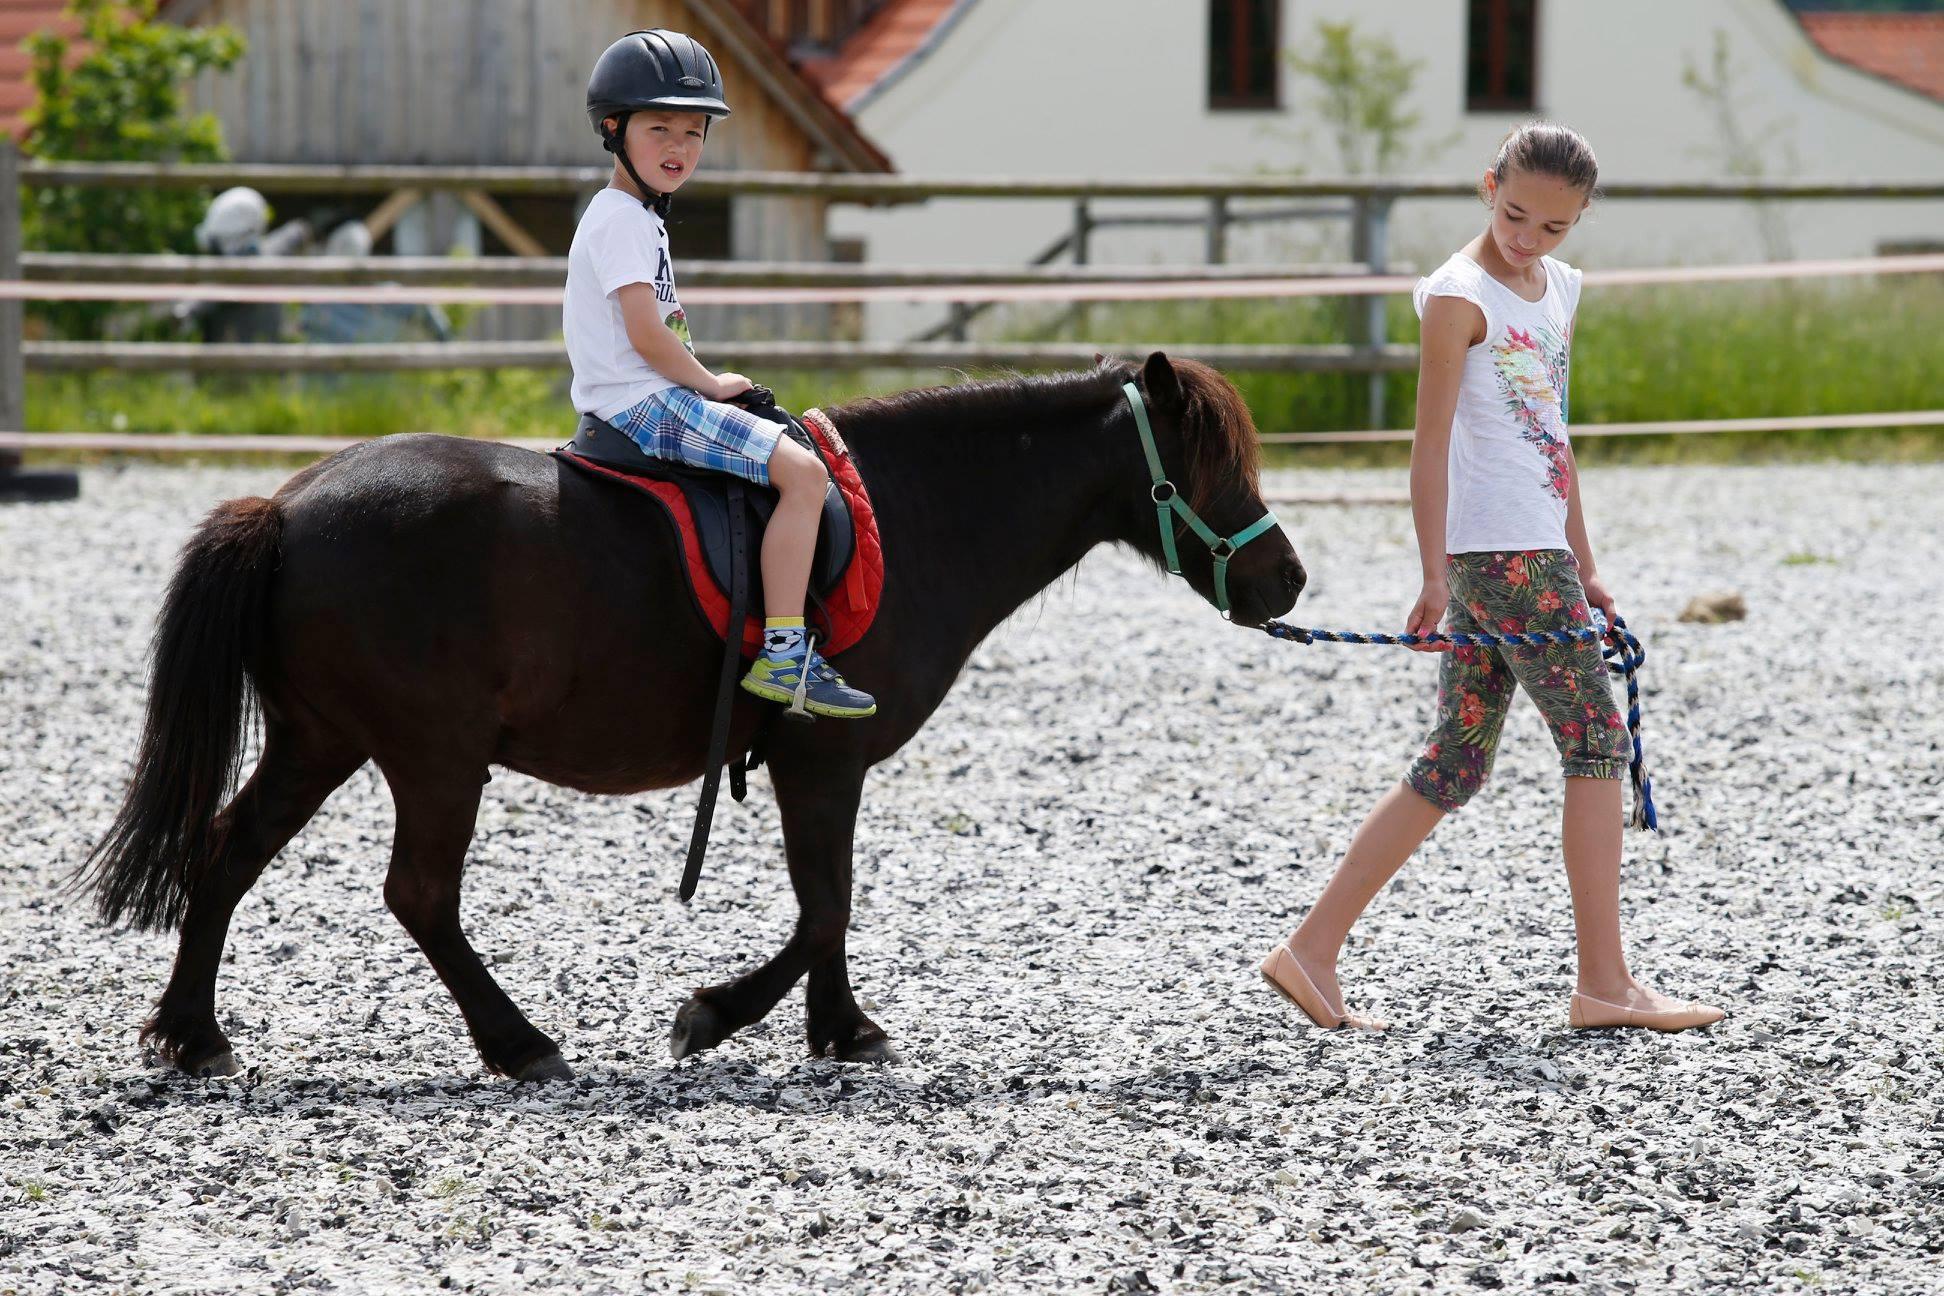 Kam v Praze s dětmi za zvířaty